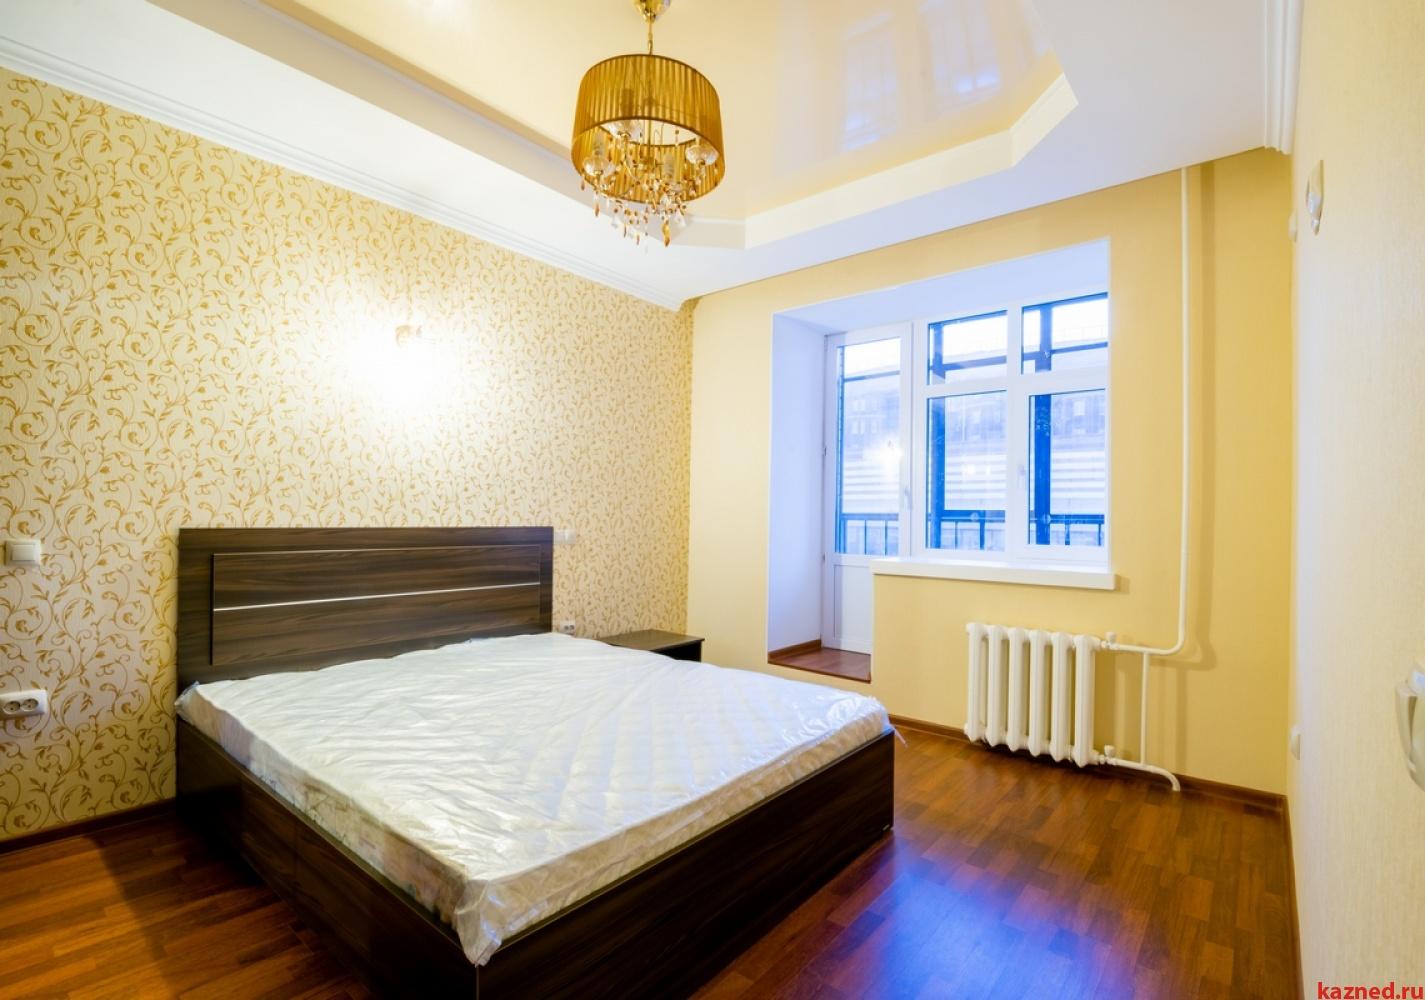 Продажа 2-к квартиры Баки Урманче д.6, 72 м² (миниатюра №11)